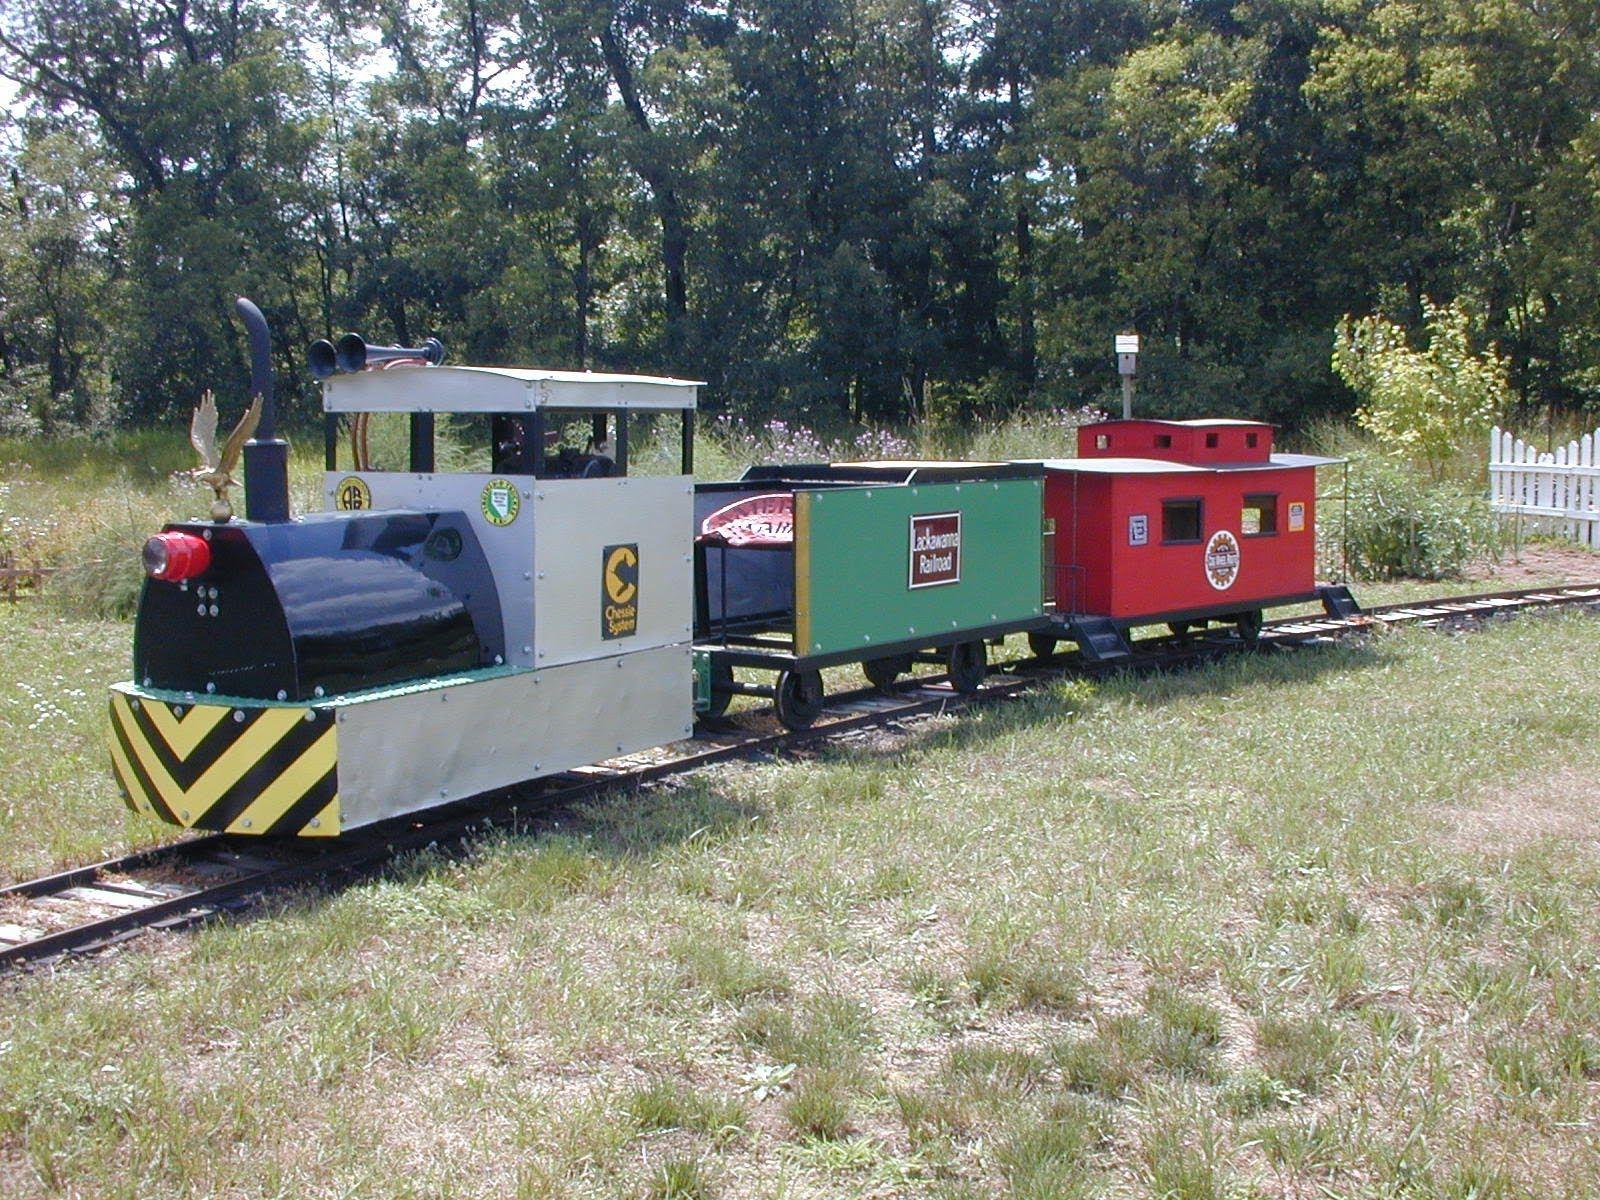 Backyard Railroad Hydraulic Locomotive Build Tips | Ride ...